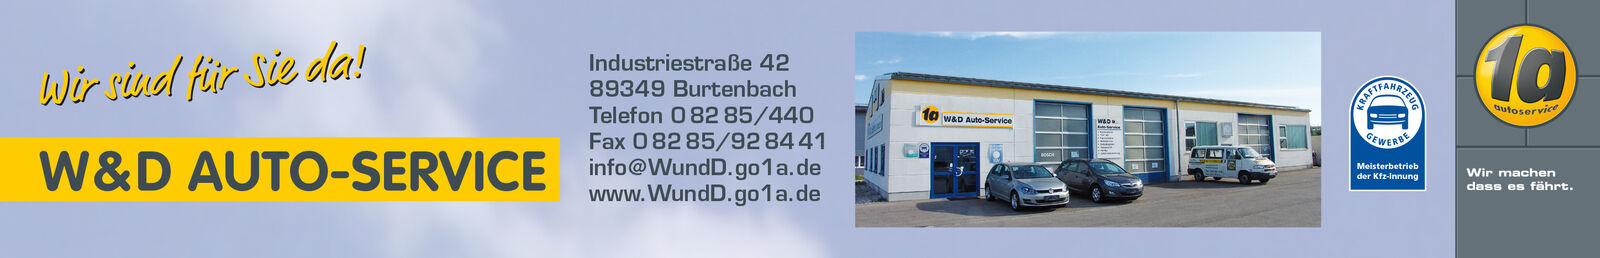 W ß D Auto-Service